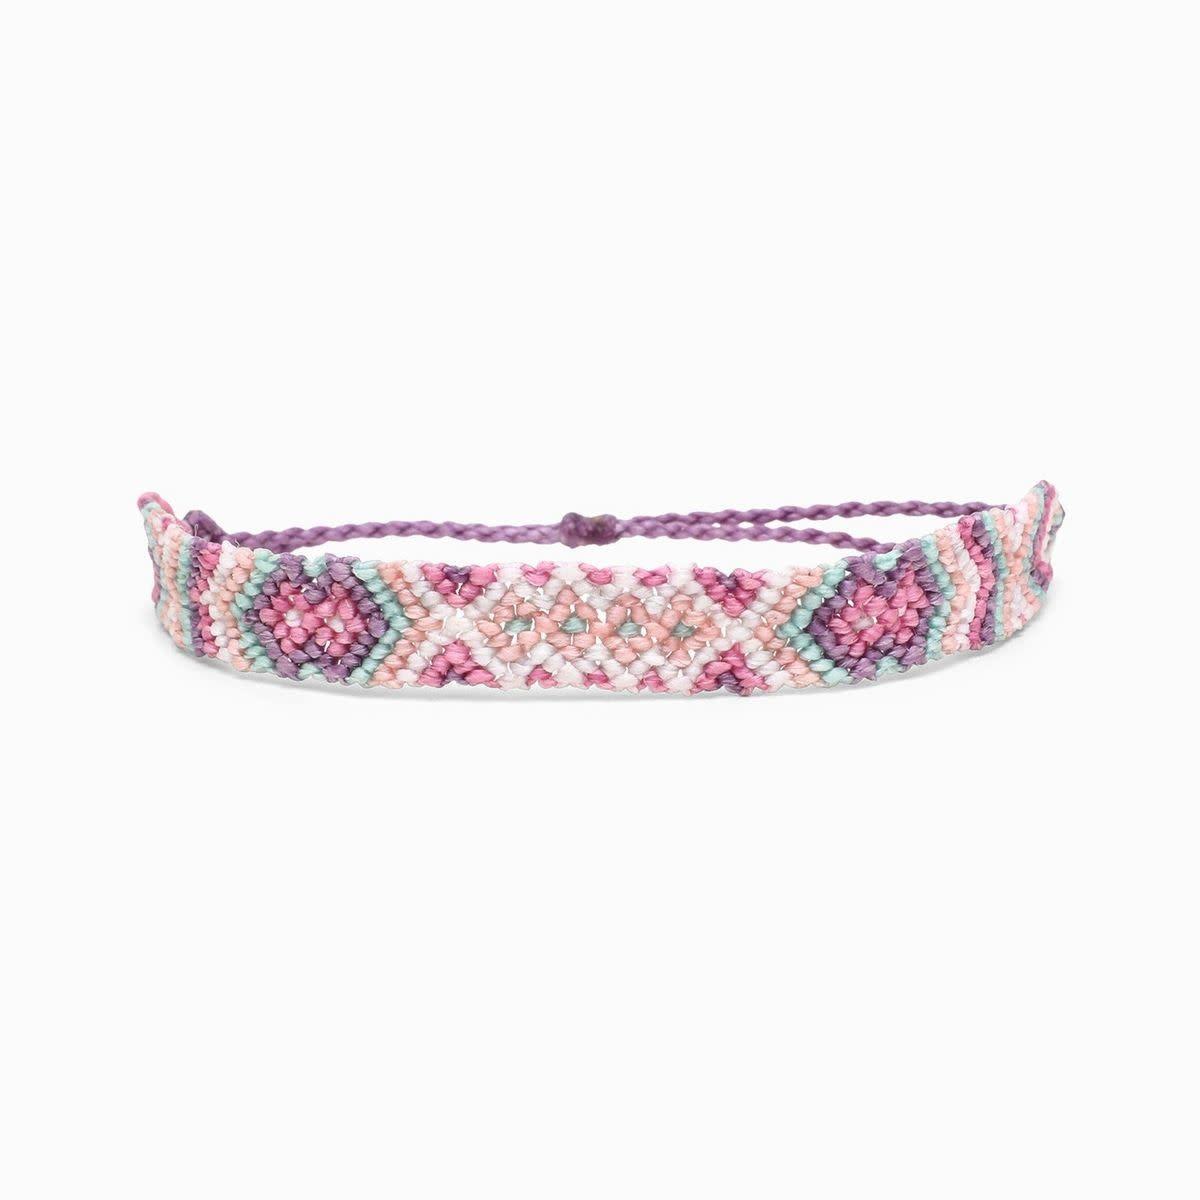 PuraVida Macrame Friendship Bracelet